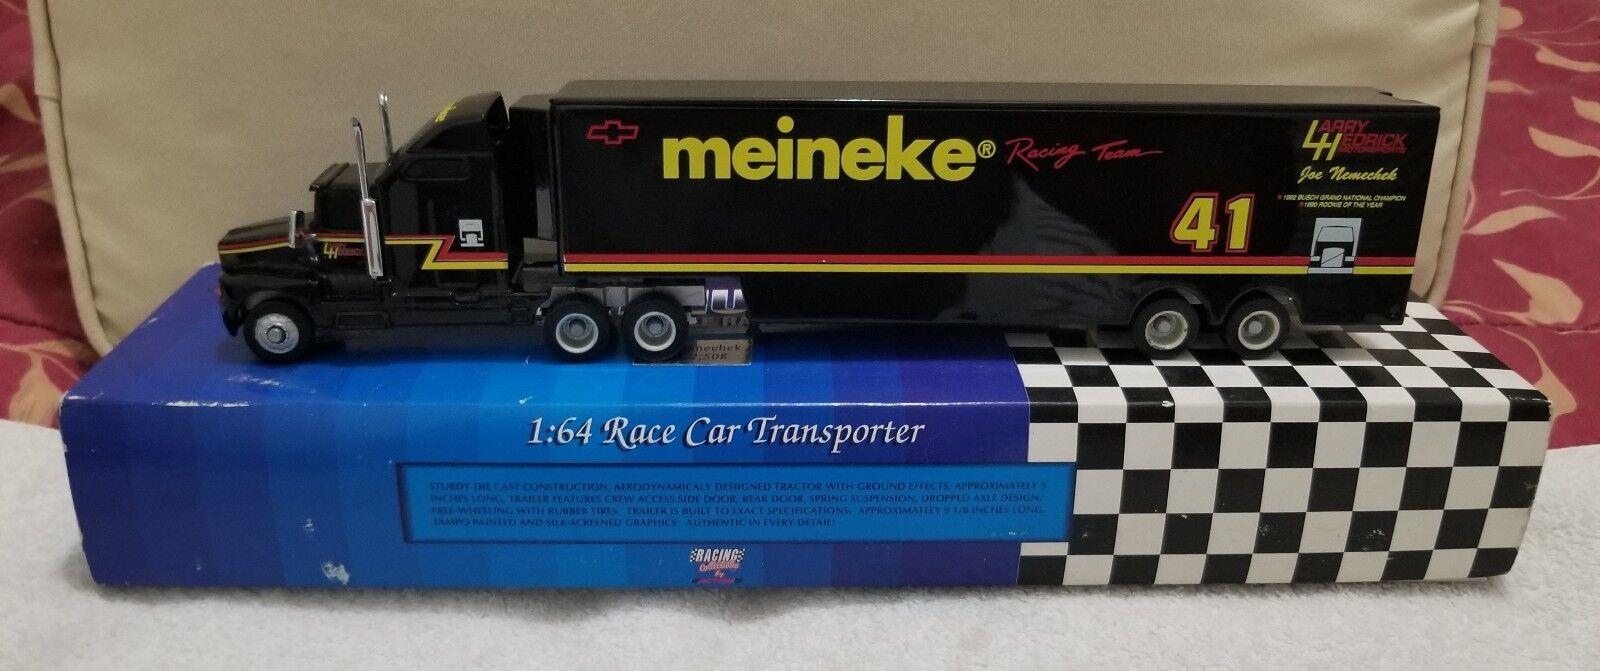 Platinum Series Joe Nemechek 1 64 Scale Race Coche Transporter 1 of 2,508 (New)